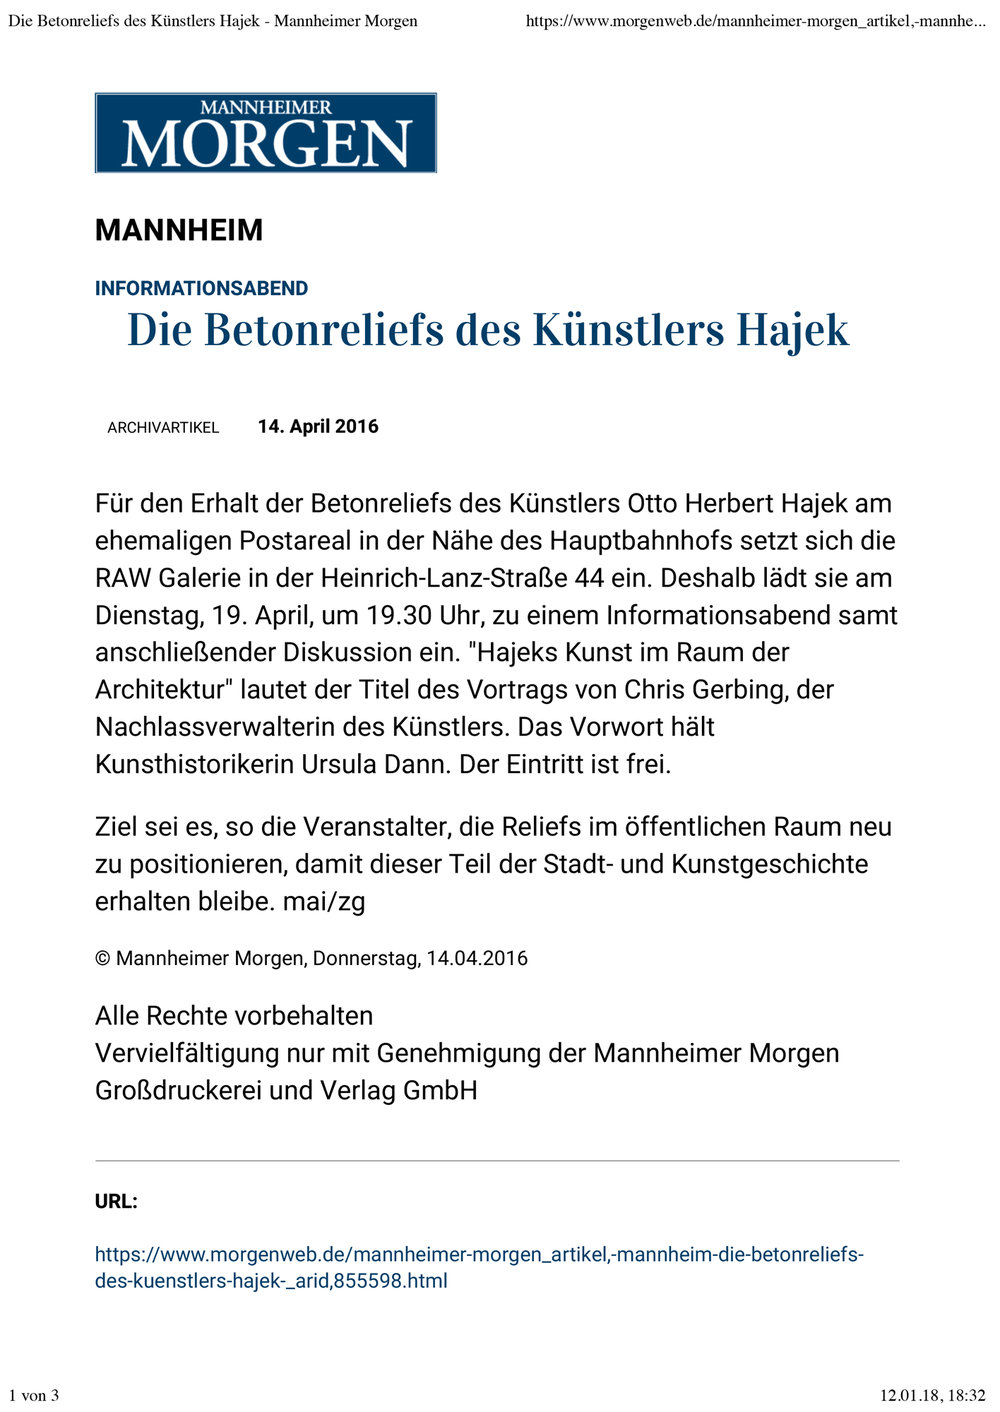 Die-Betonreliefs-des-Kuenstlers-Hajek---Mannheimer-Morgen-1.jpg